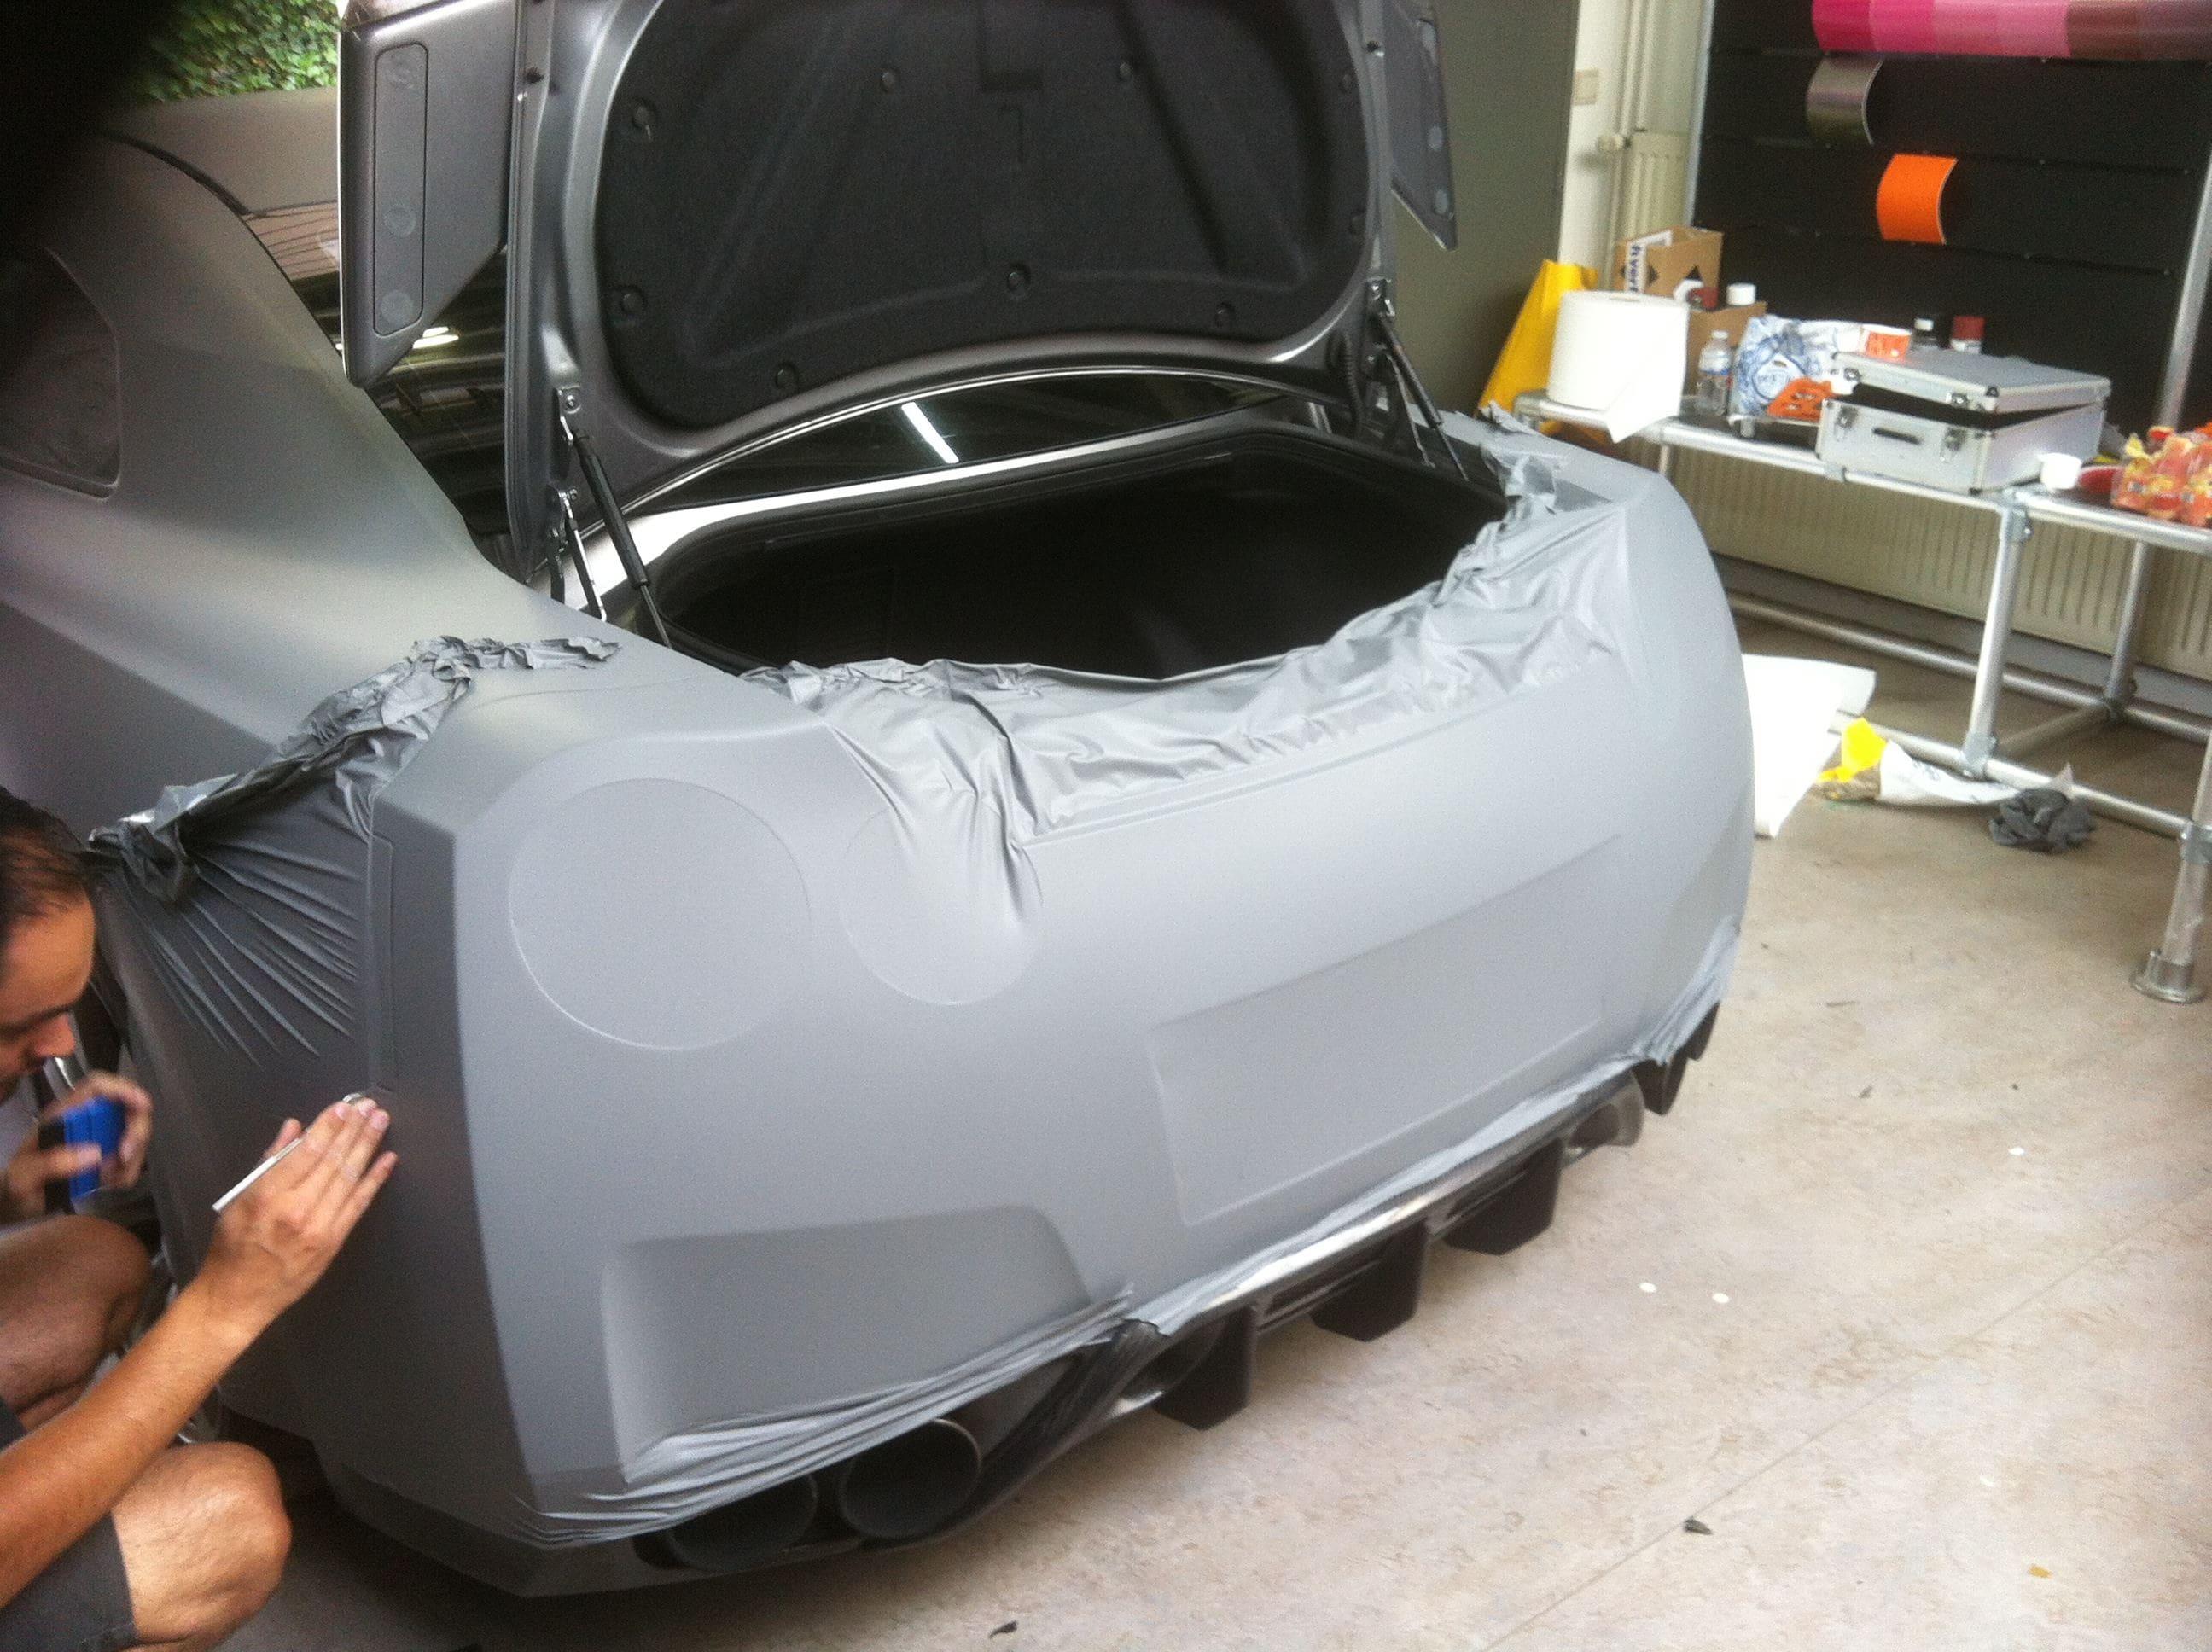 Nissan GT-R met Mat Grijze Wrap, Carwrapping door Wrapmyride.nu Foto-nr:6549, ©2021